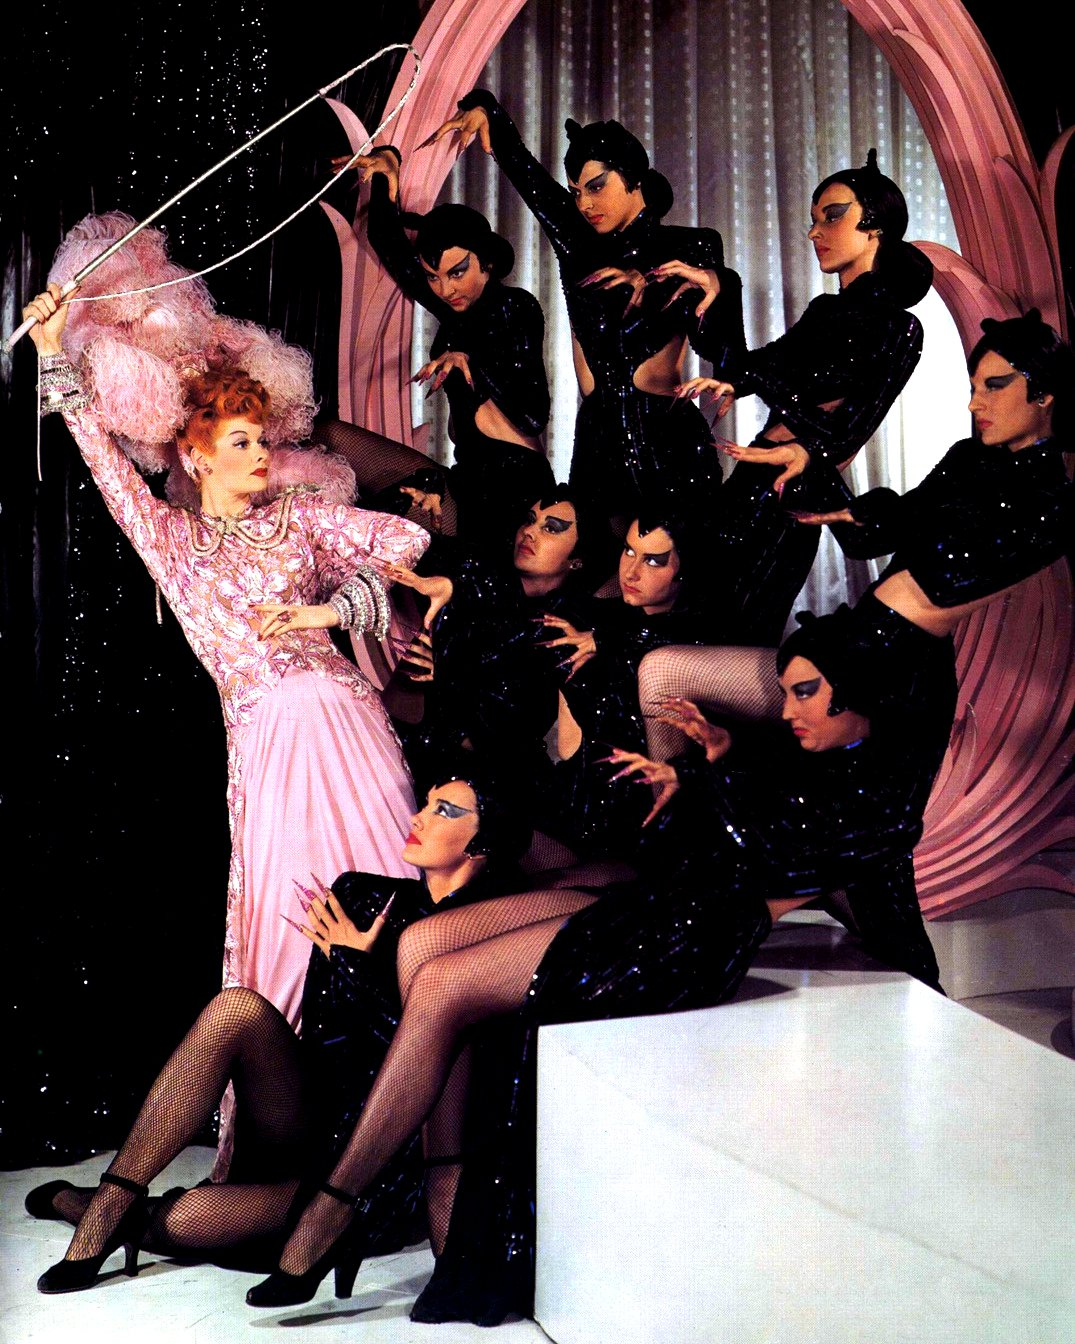 LUCILLE BALL IN MUSICAL COMEDY 'ZIEGFELD FOLLIES' 8X10 PUBLICITY PHOTO (DD-066)